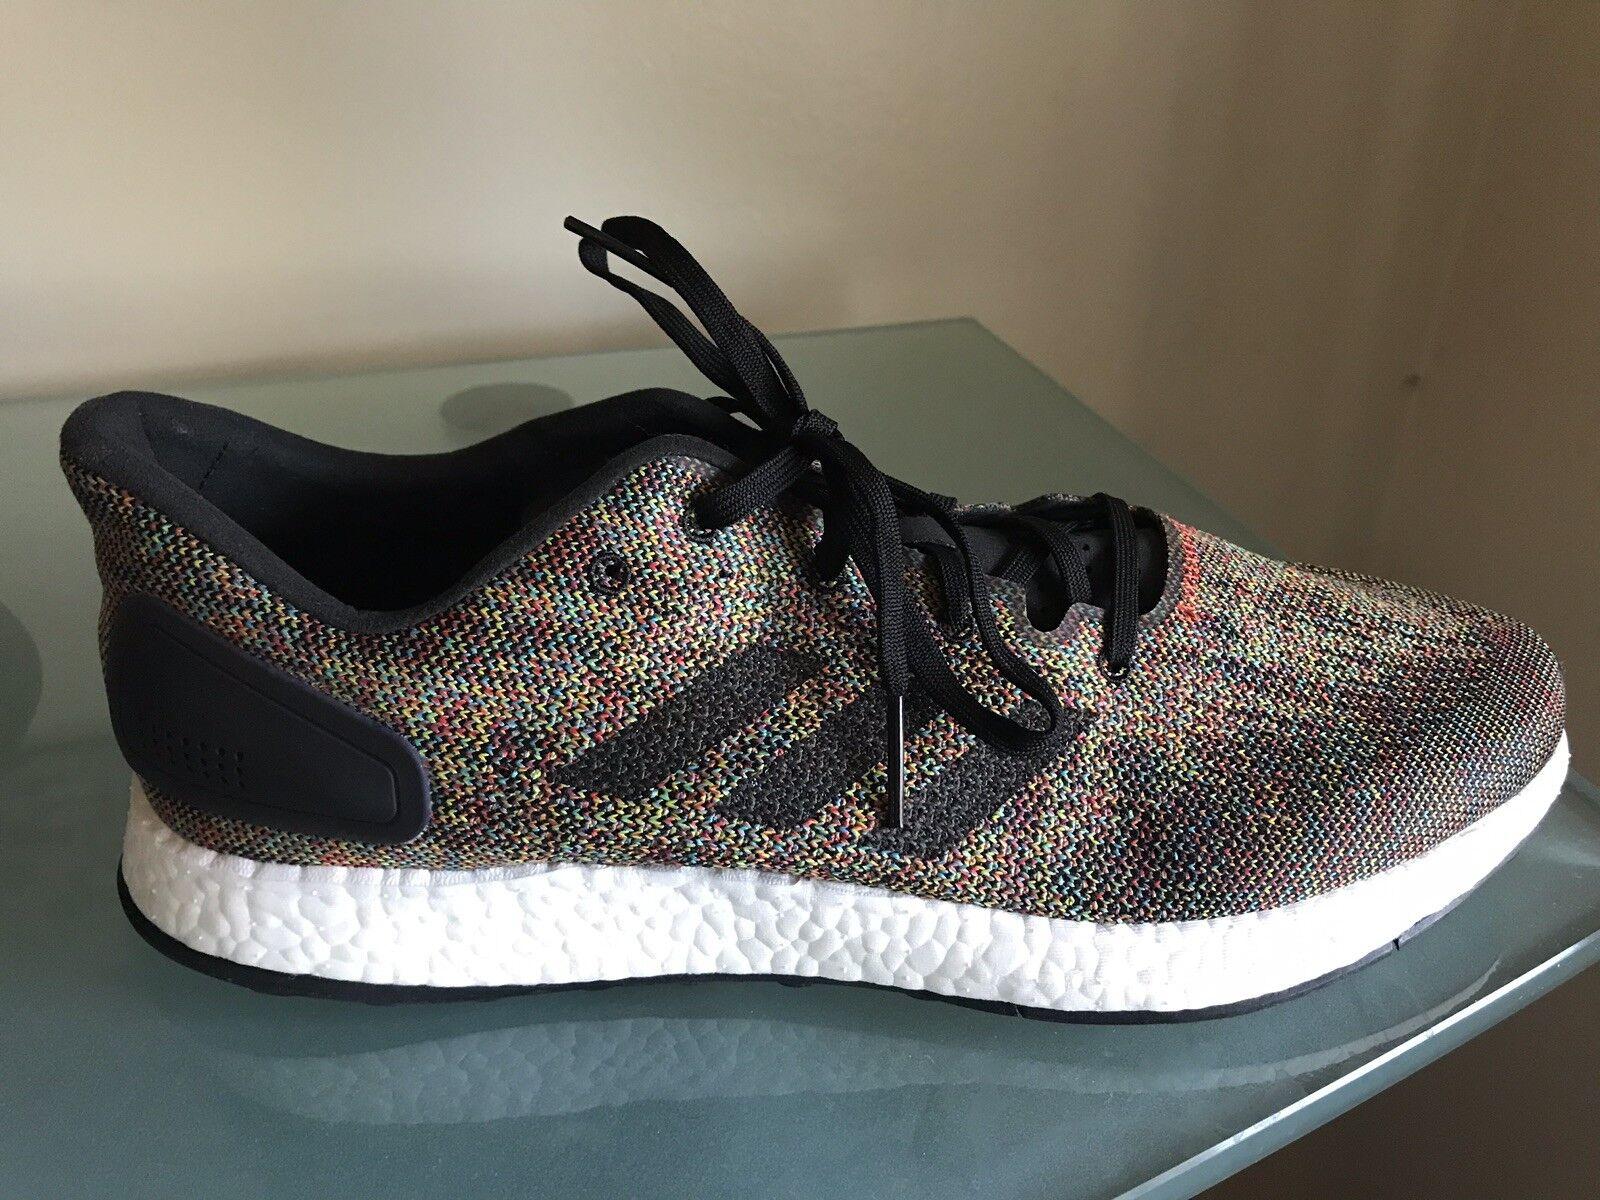 New  169 Size 11.5 11.5 11.5 Adidas PureBoost DPR LTD Black Crystalwhite Rainbow CG2993 78bc54